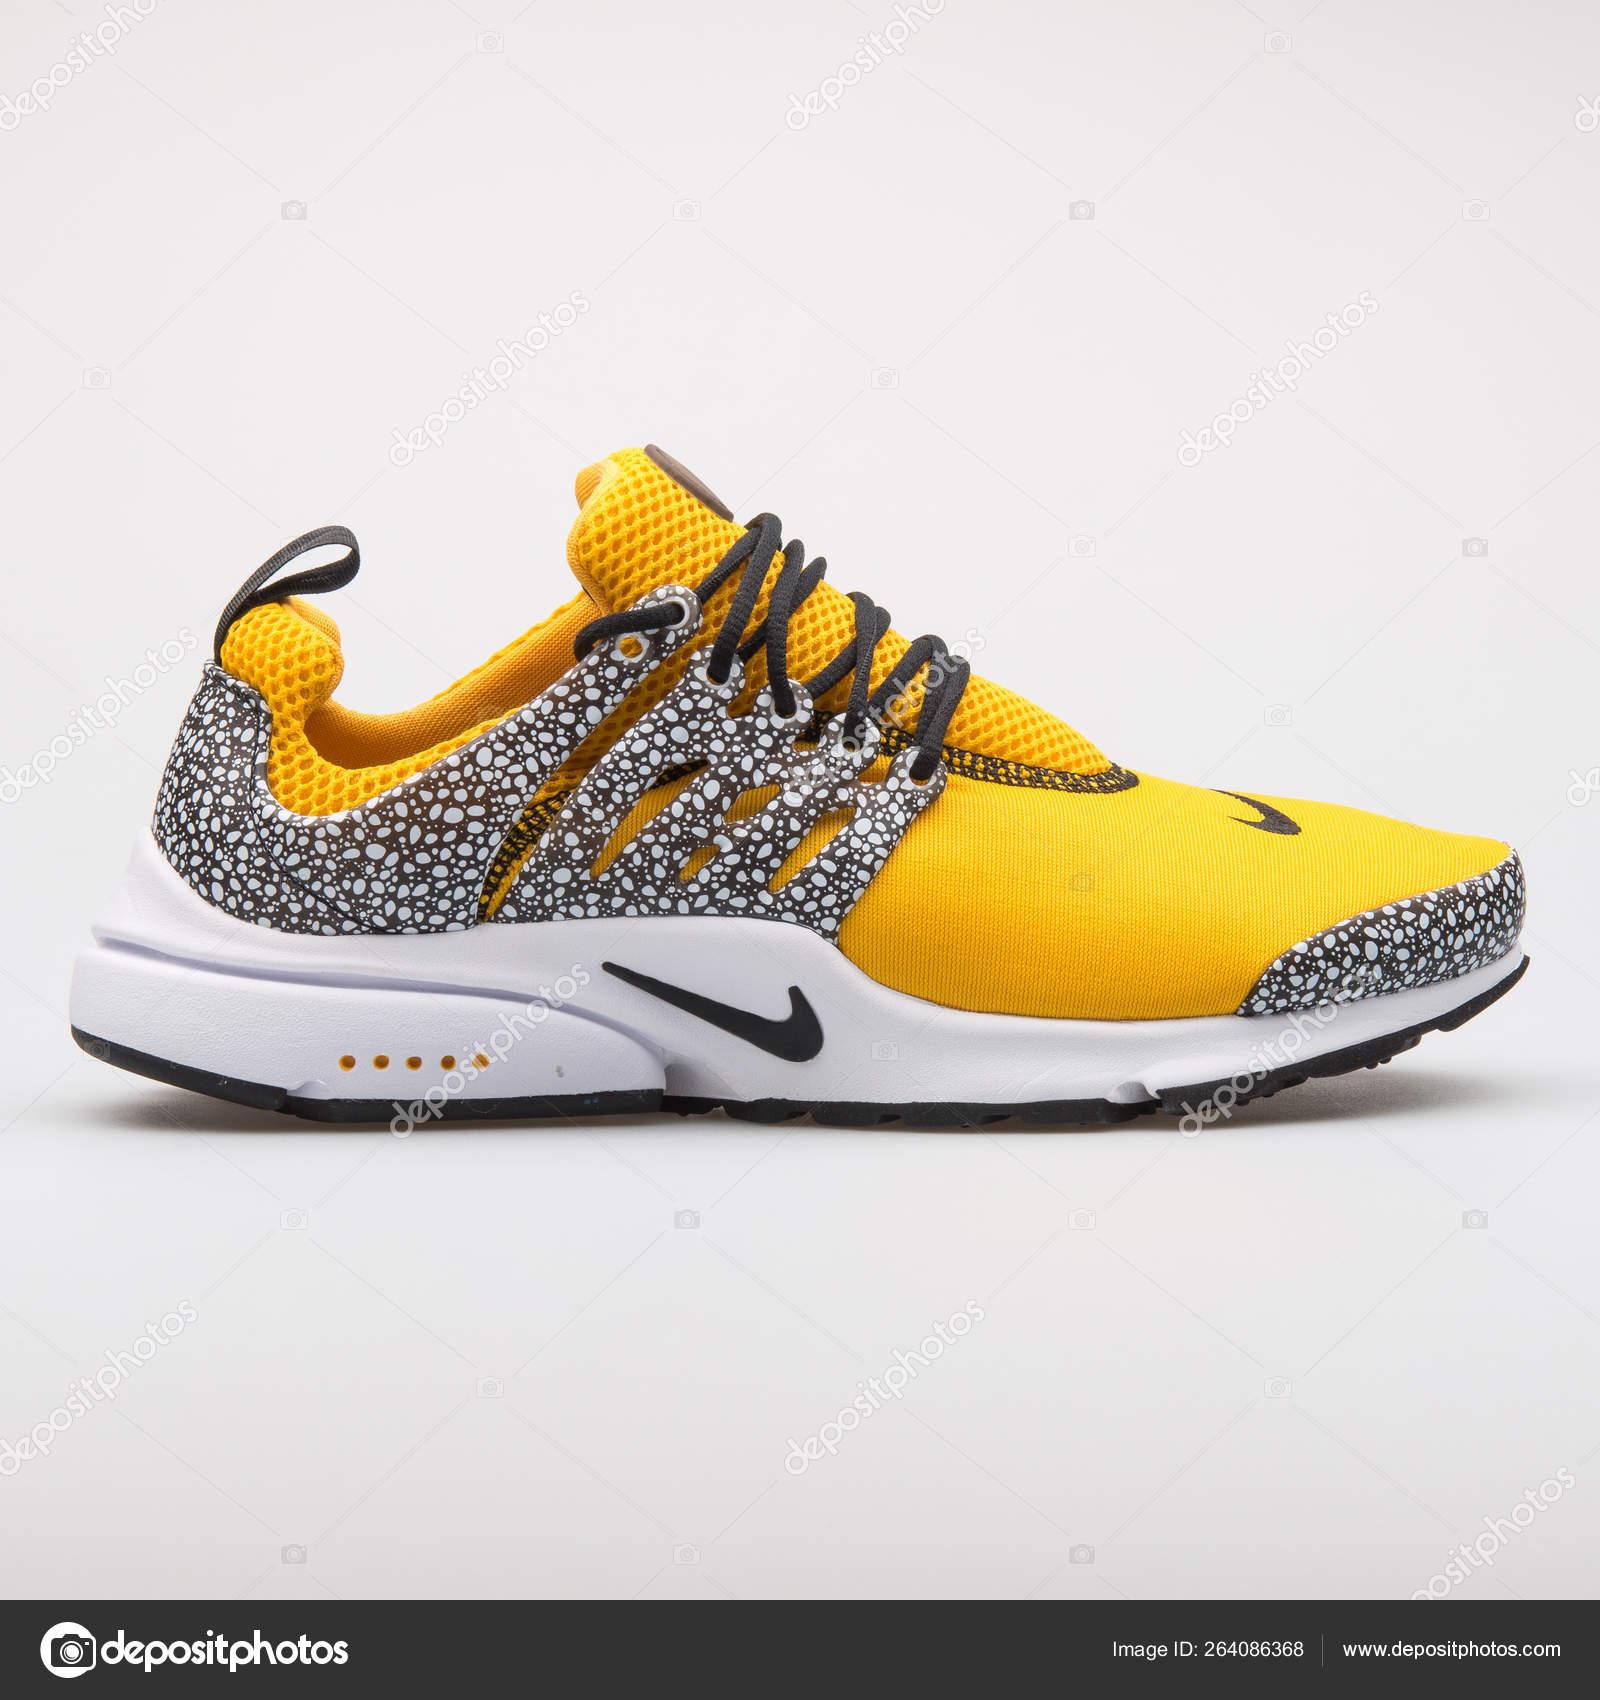 Nike Air Presto QS yellow and black